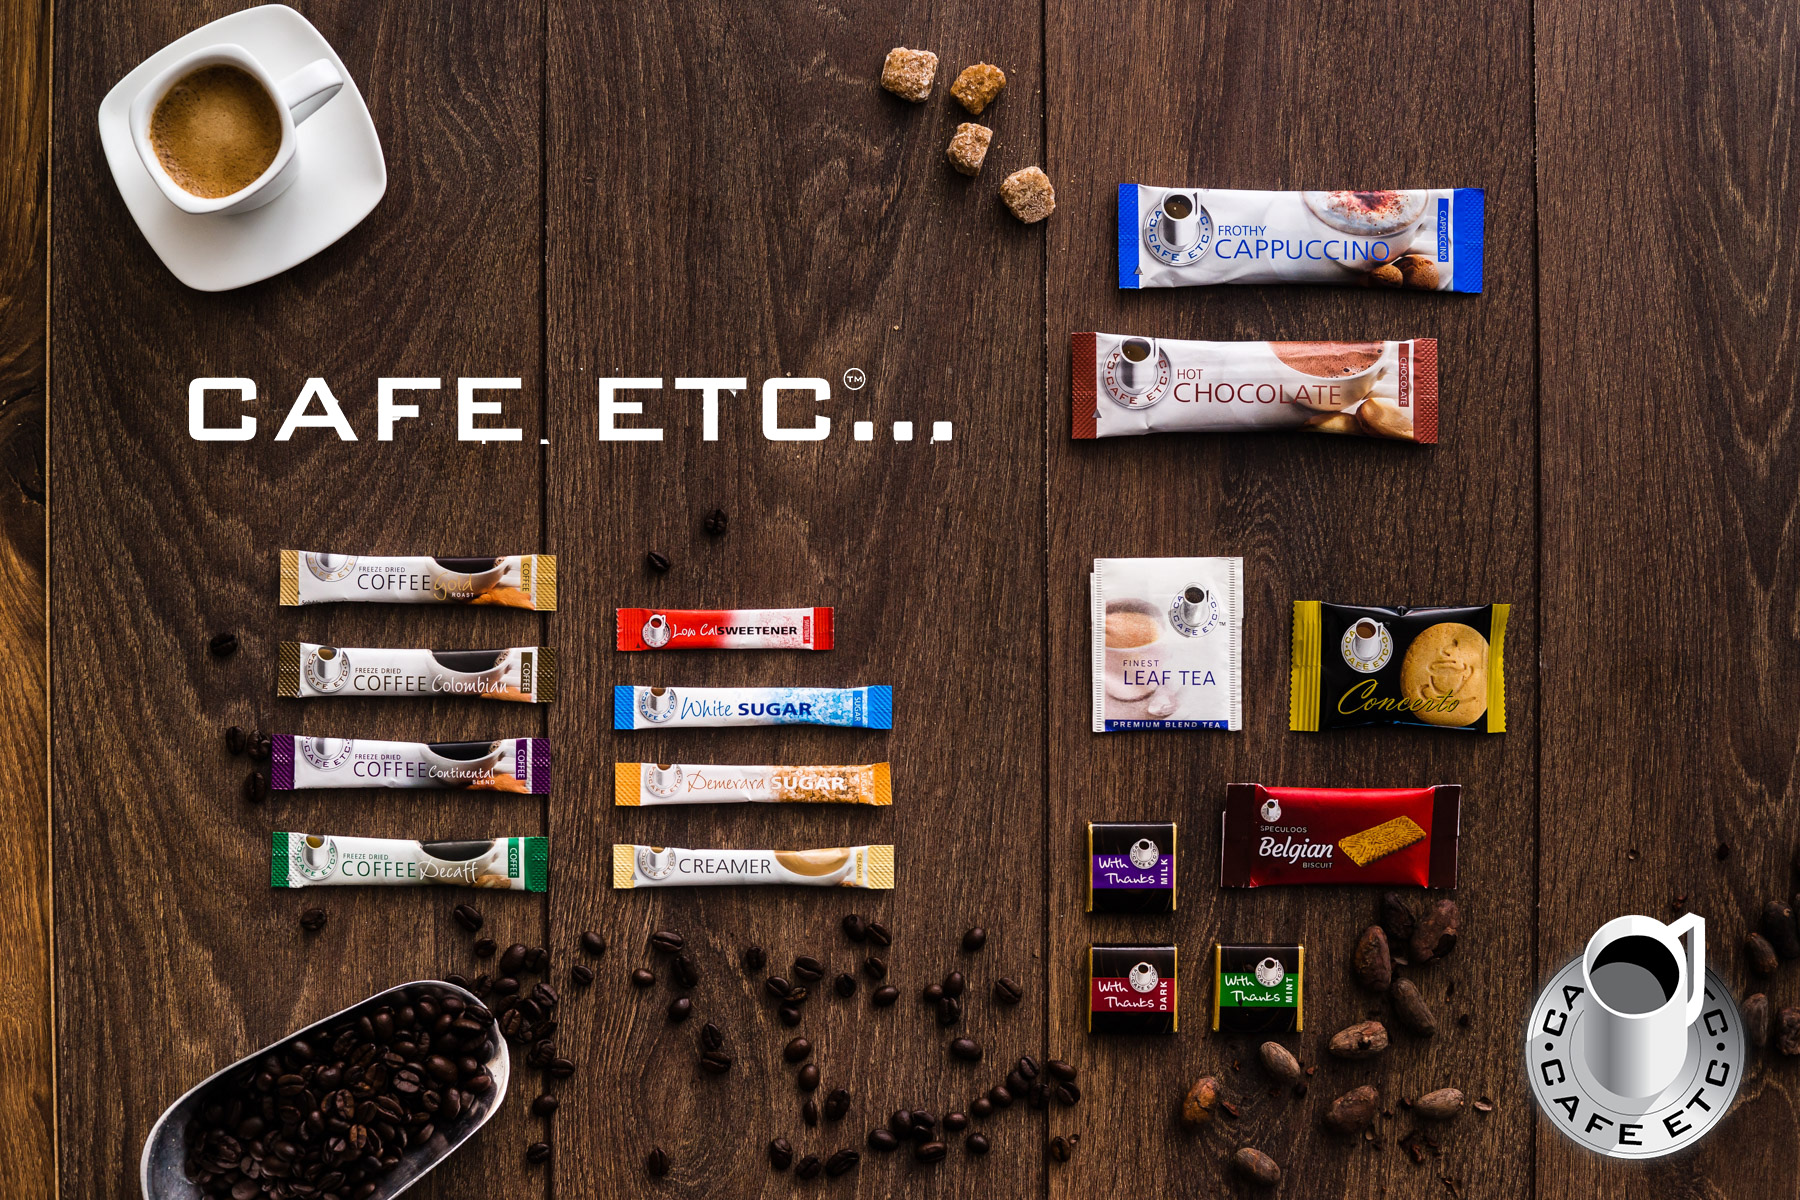 Cafe Etc overview.jpg